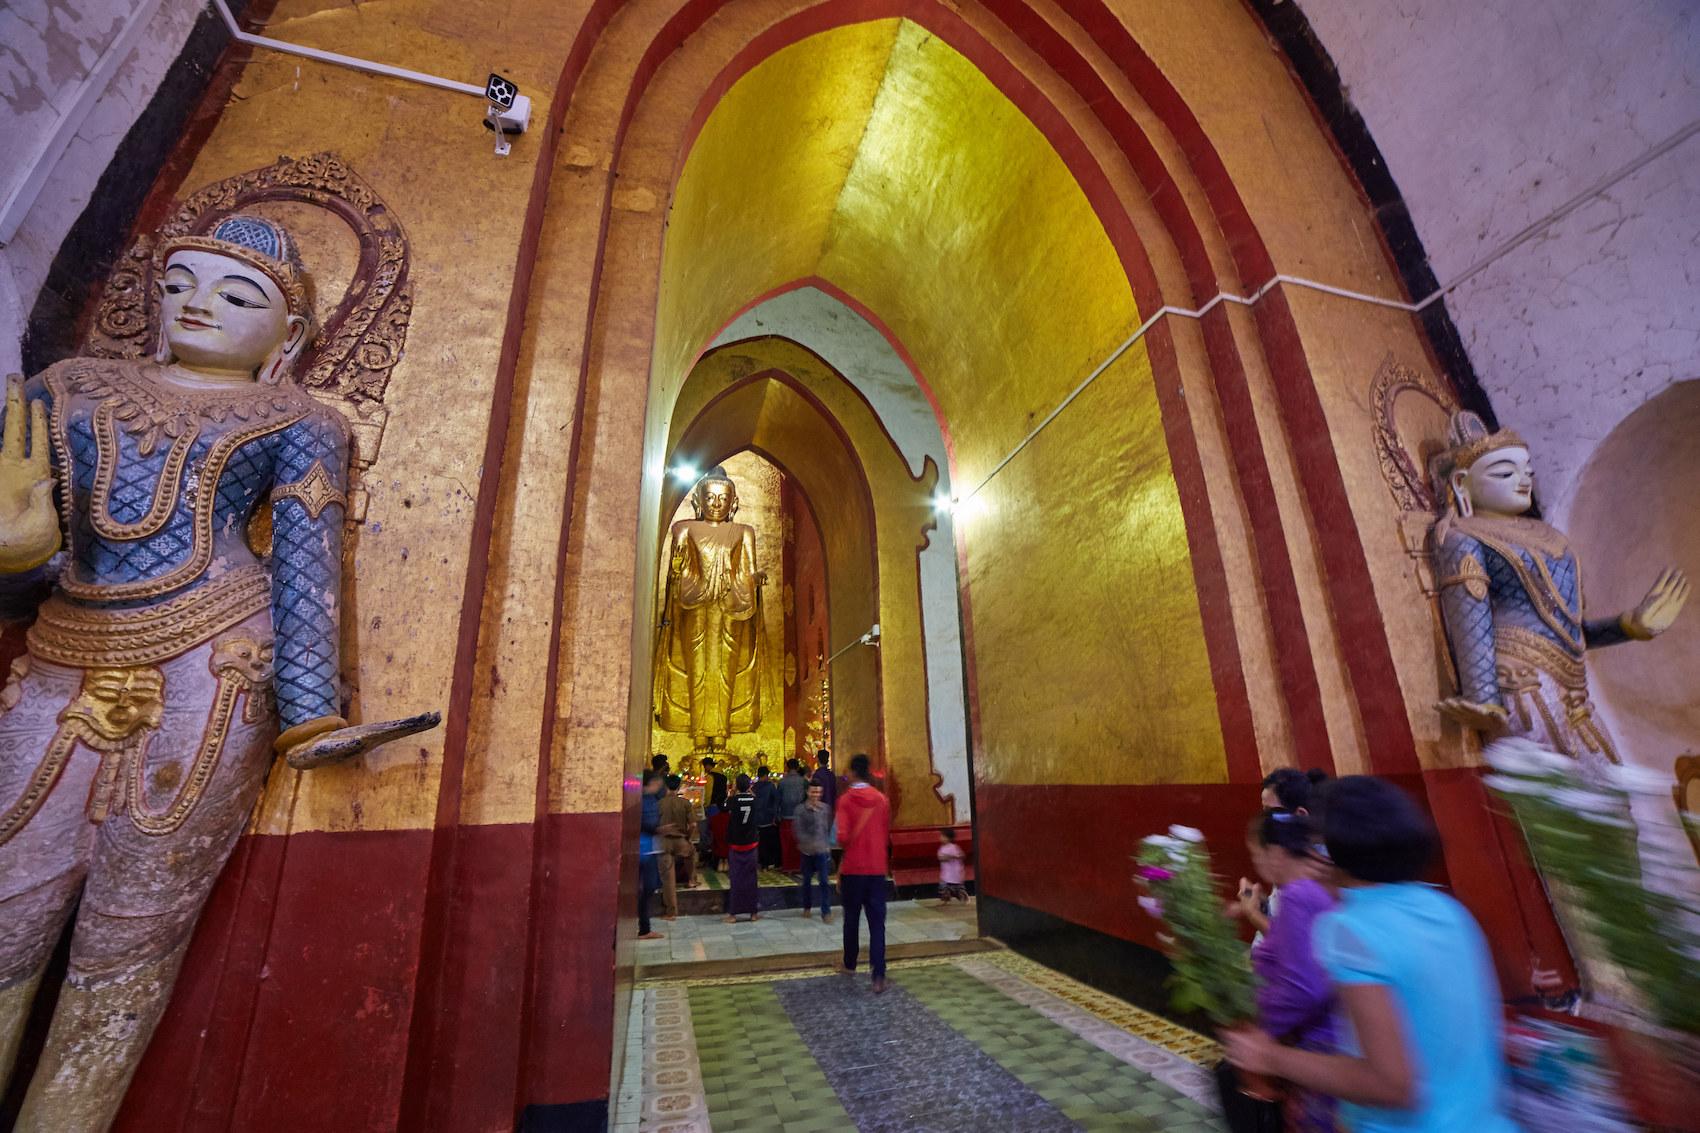 Bagan Ananda Buddha Statue